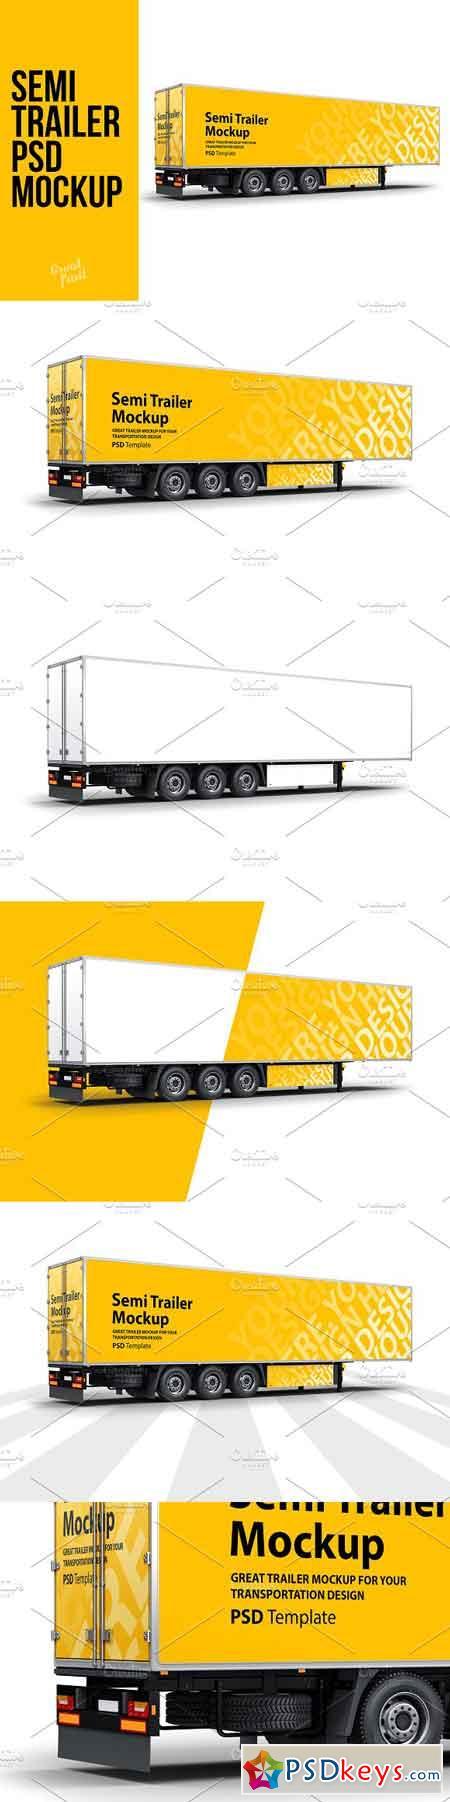 Semi Trailer Truck PSD Mockup 3202967